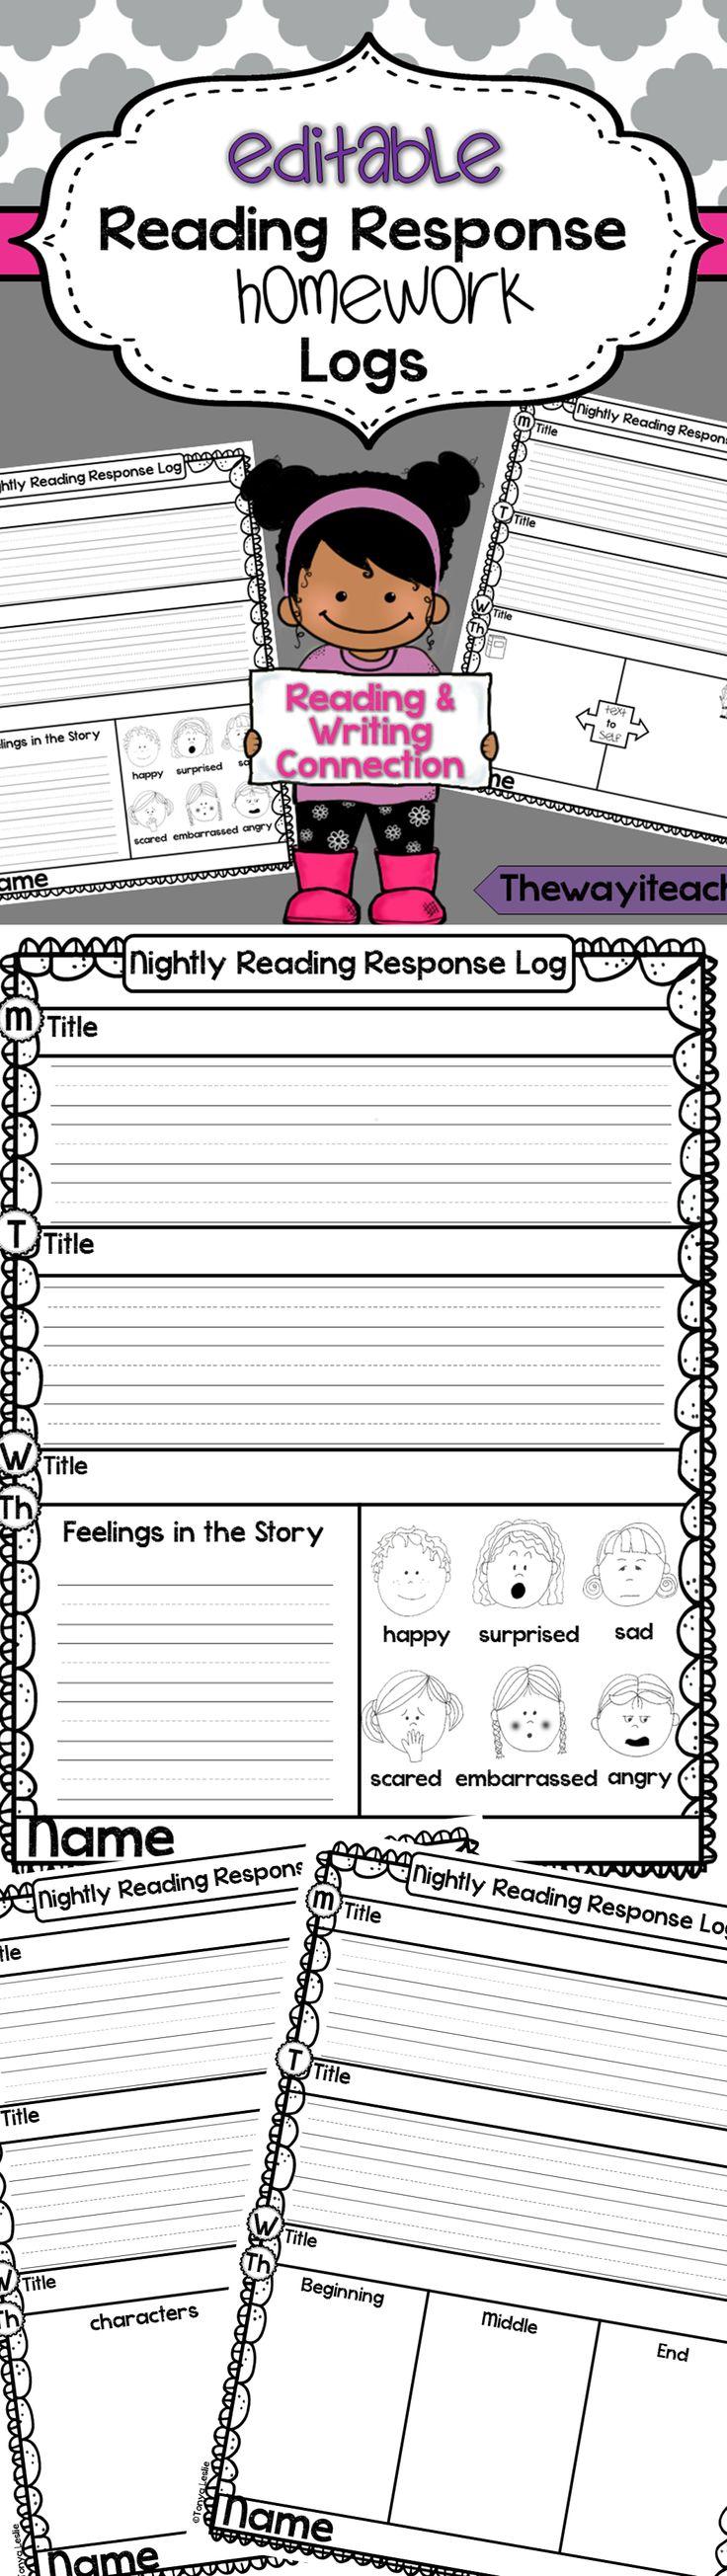 Reading Log: Reading Response Homework Logs. Editable Newsletter Pages